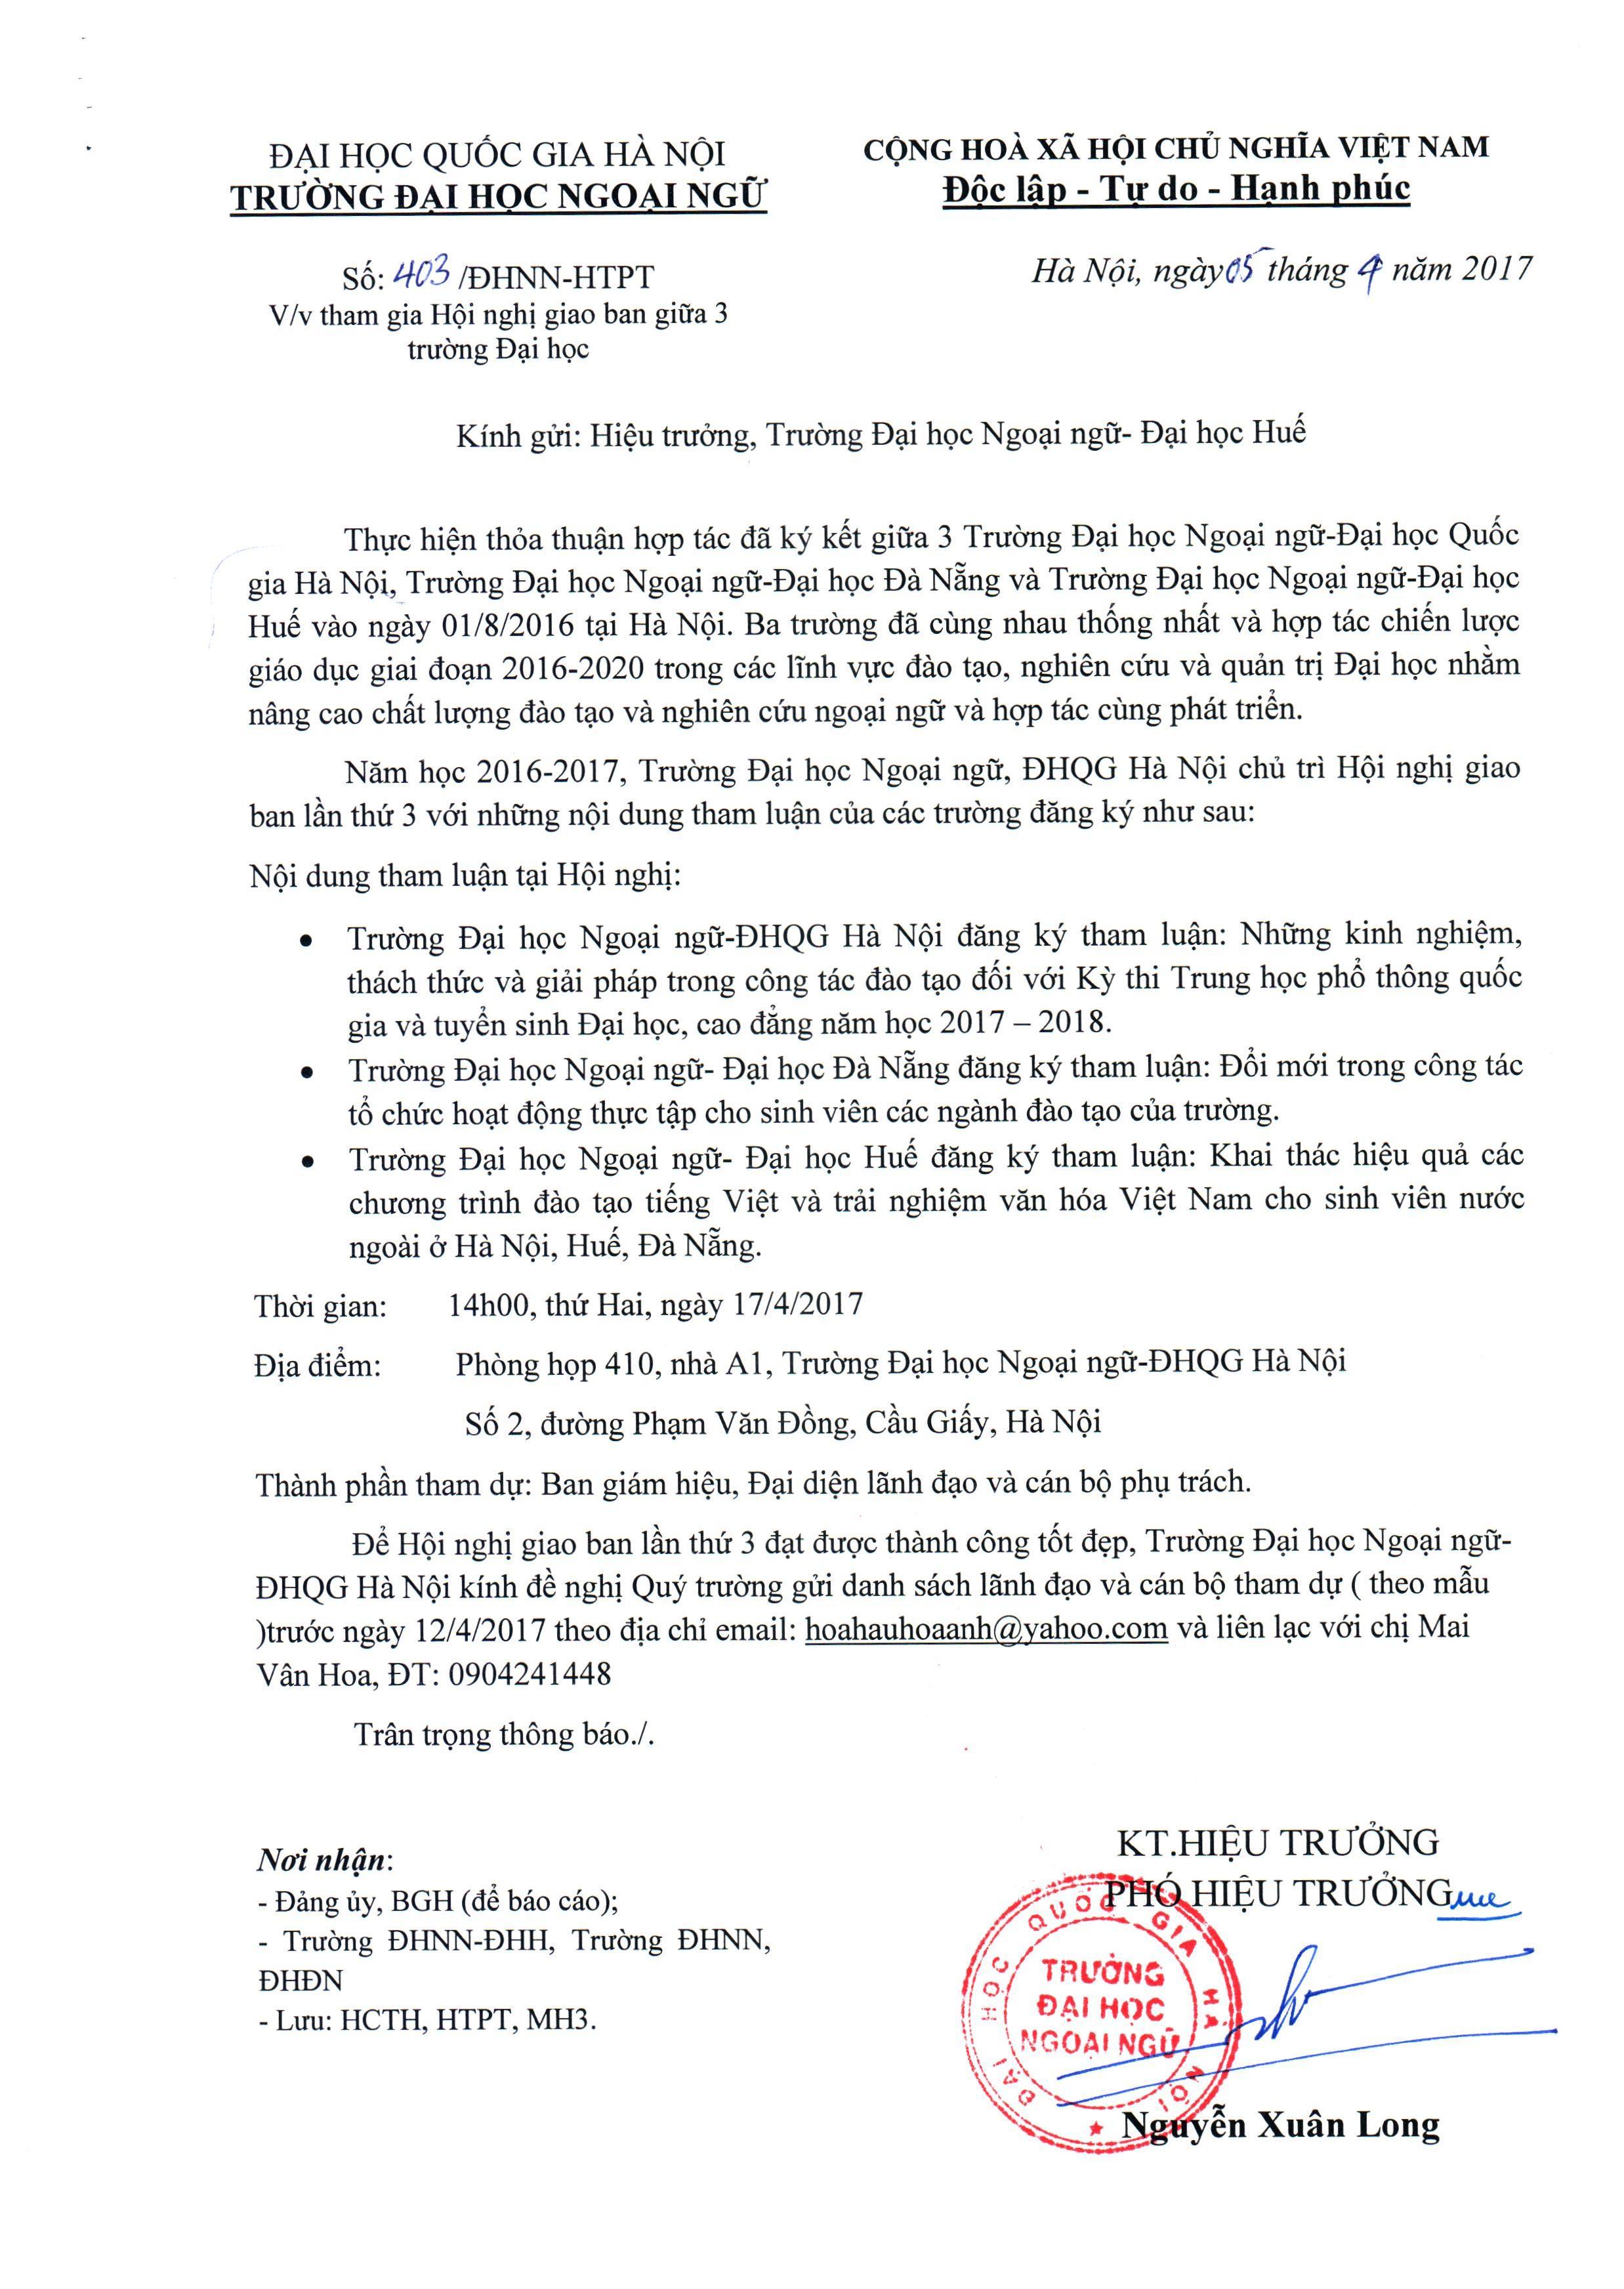 403_chuong-trinh-hoi-nghi-giao-ban-3-truong-page-001